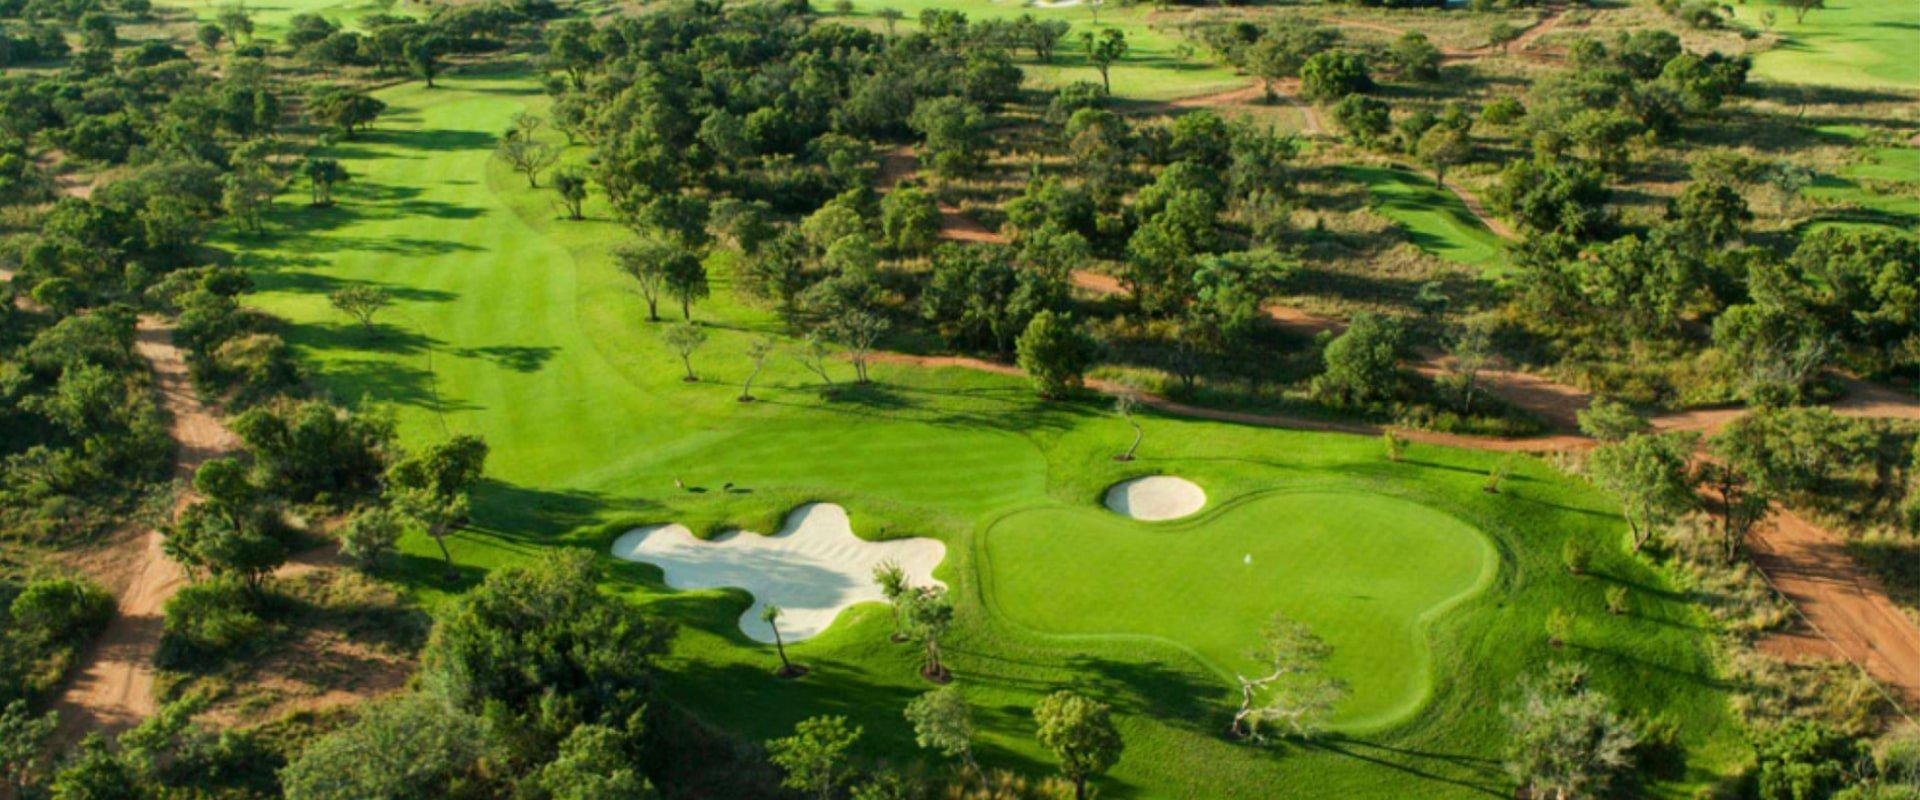 Play Golf at Arabella Golf Course